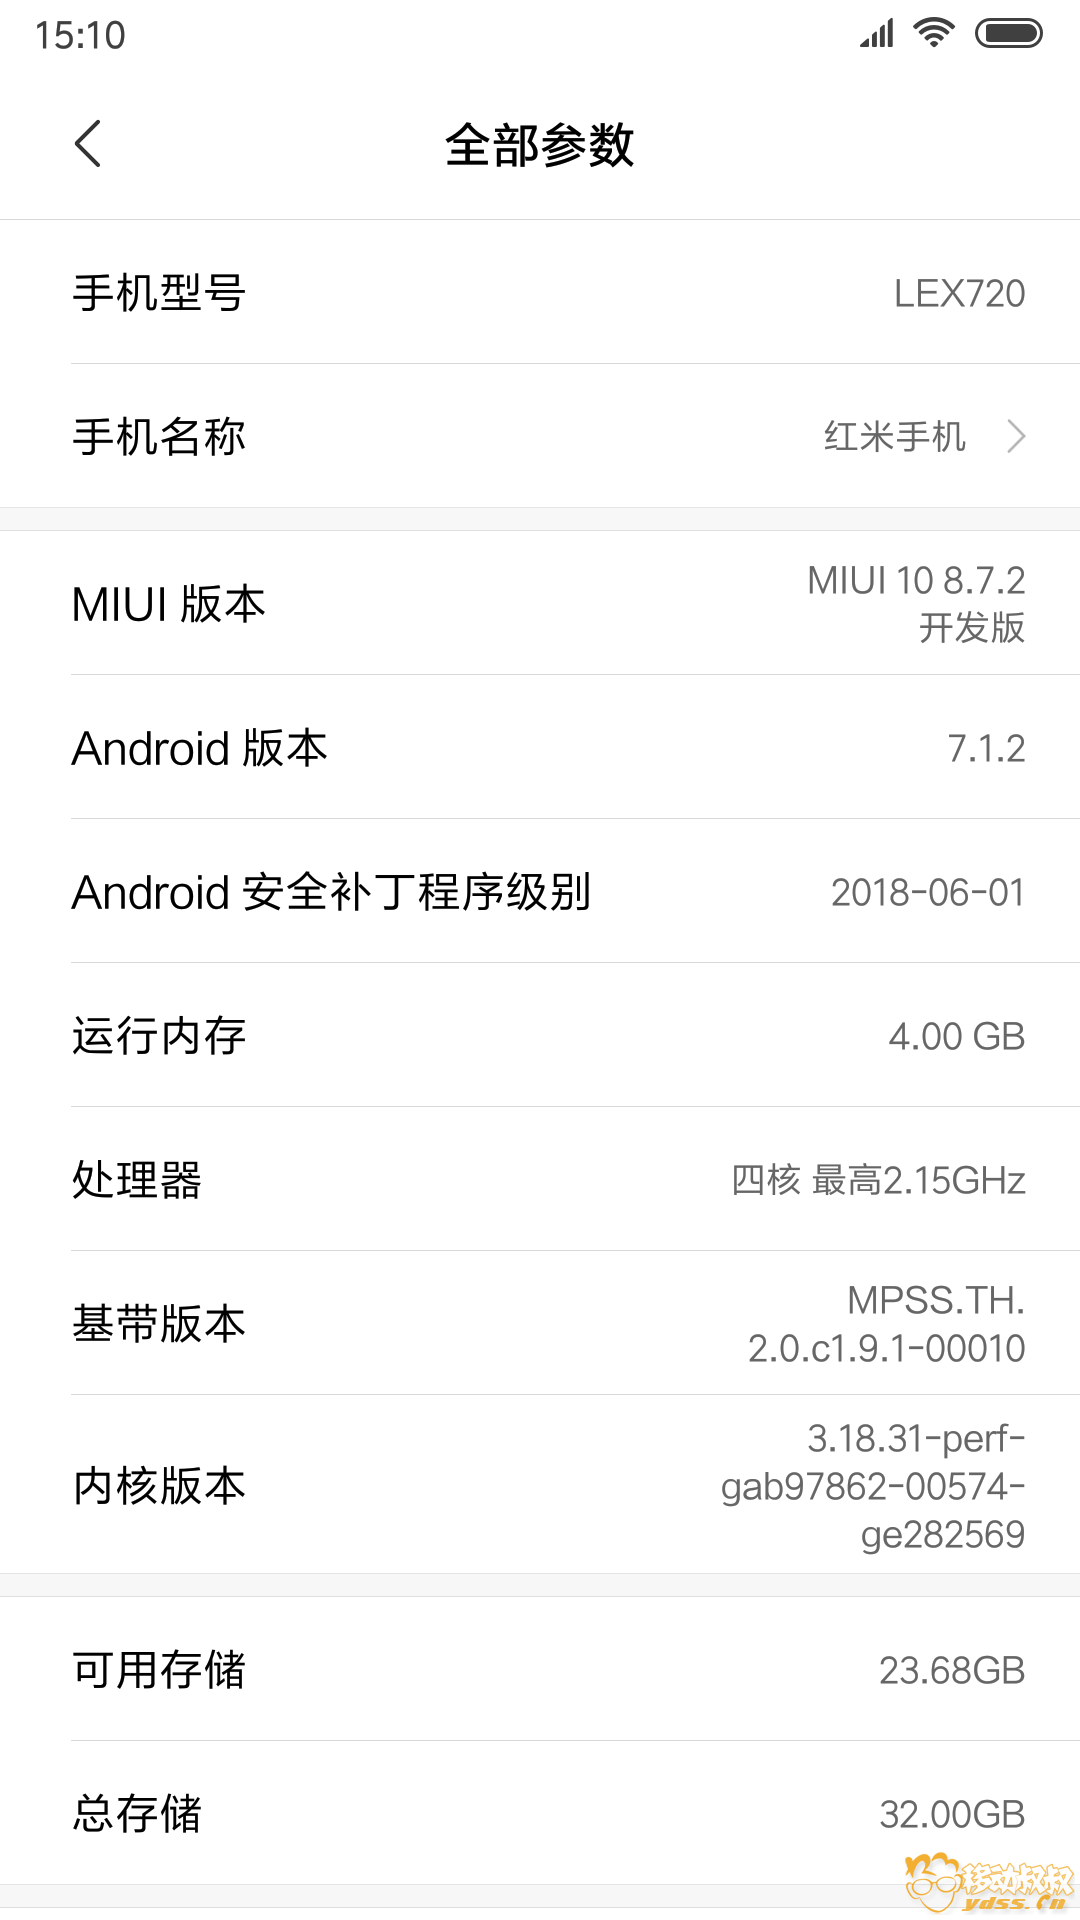 Screenshot_2018-07-03-15-10-06-783_com.android.settings.png